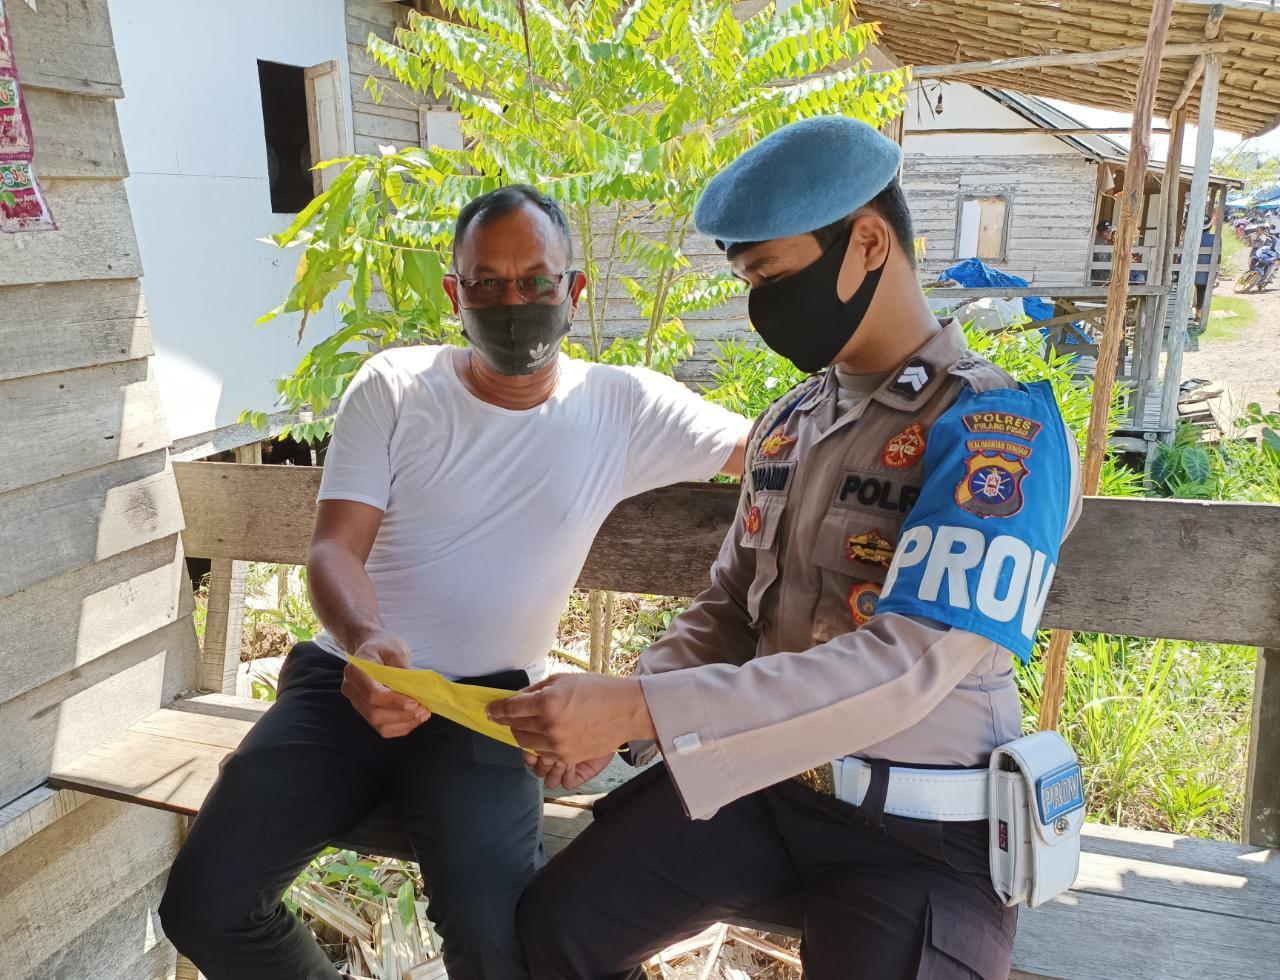 Cegah Penyebaran Virus Corona, Personel Polsek Kahayan Kuala Lakukan Sosialisasi Protokol Kesehatan